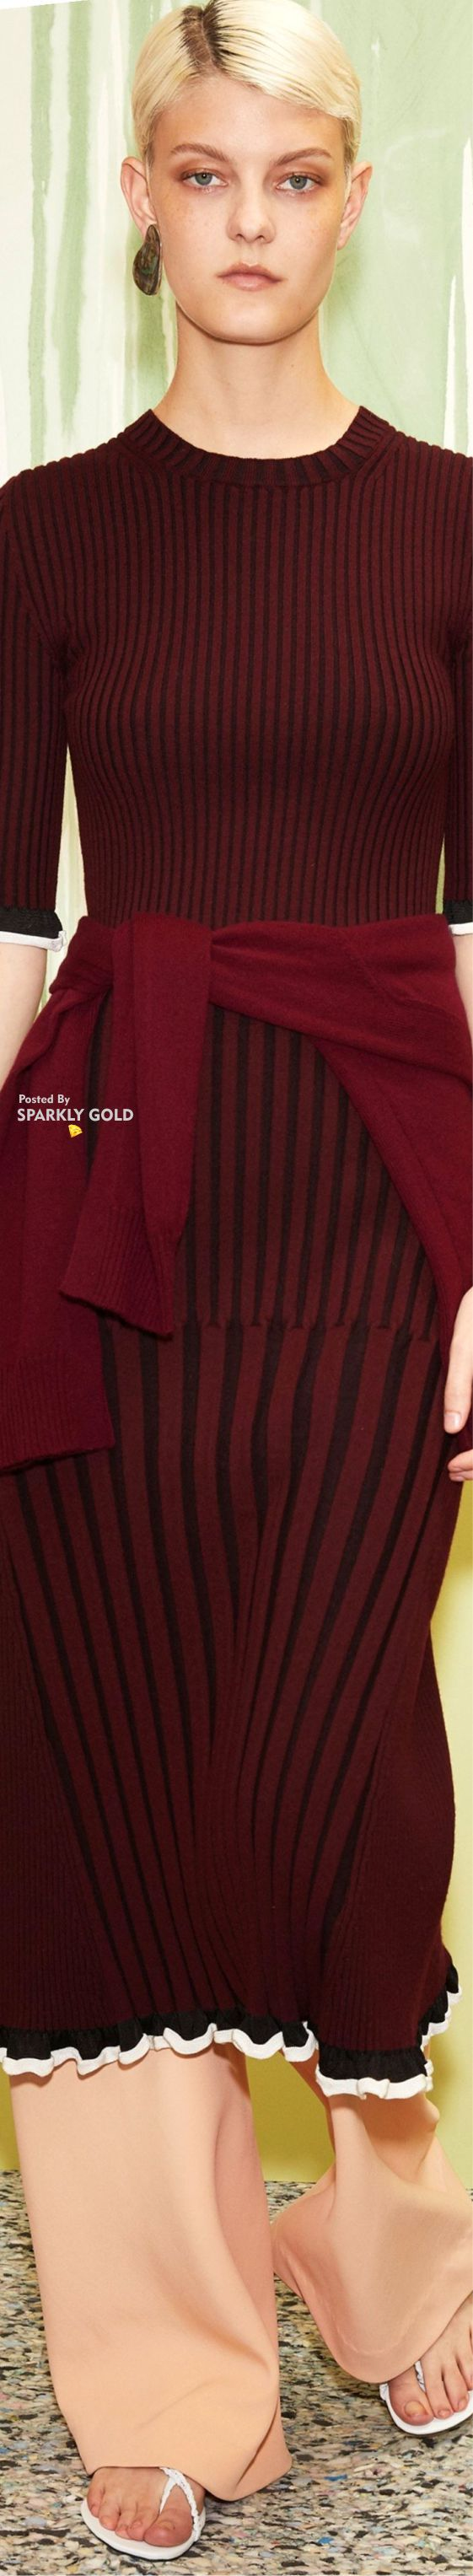 2 piece white lace dress may 2019 Rosetta Getty Resort   Resort   Pinterest